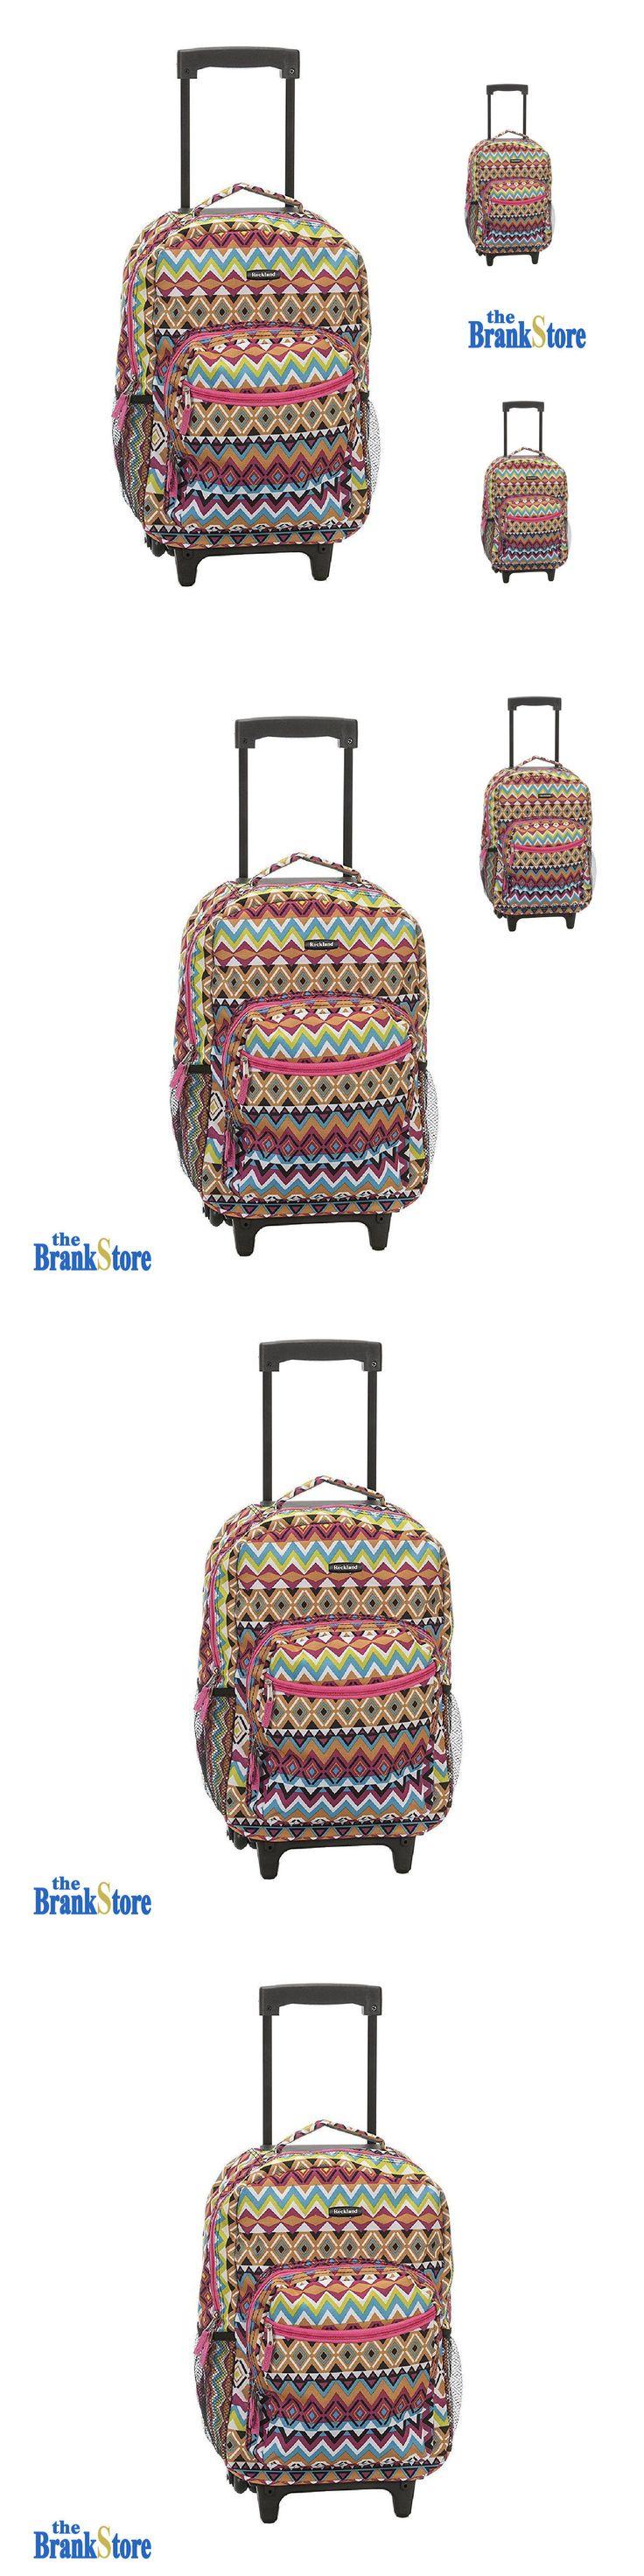 25 best ideas about kipling backpack on pinterest school handbags - Backpacks 57917 Kids Rolling Backpack Girls Roller School Bag Children Student Luggage Book Bags